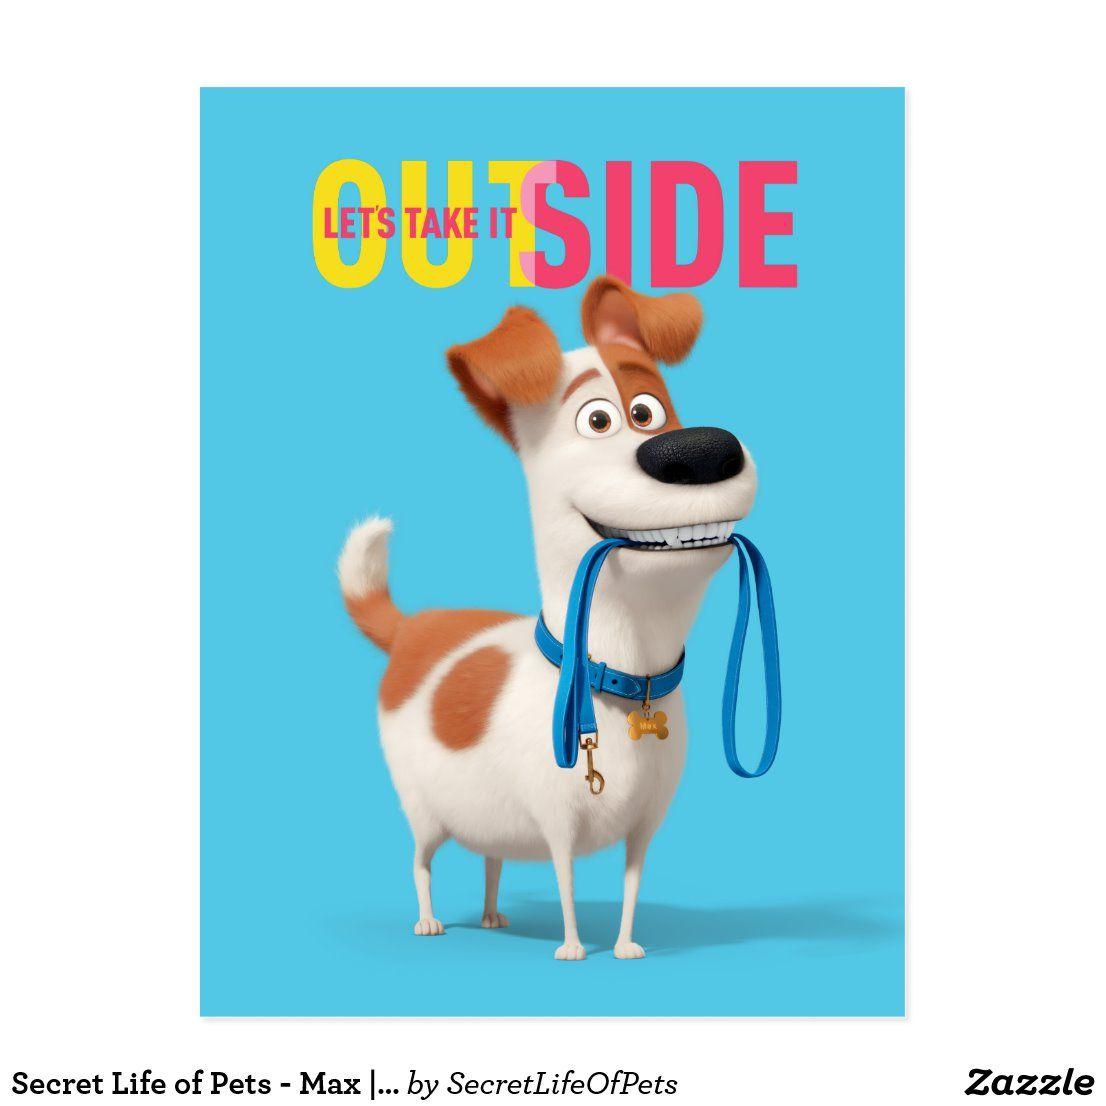 Secret Life Of Pets Max Take It Outside Postcard Zazzle Com In 2020 Pet Max Secret Life Of Pets Pets Movie